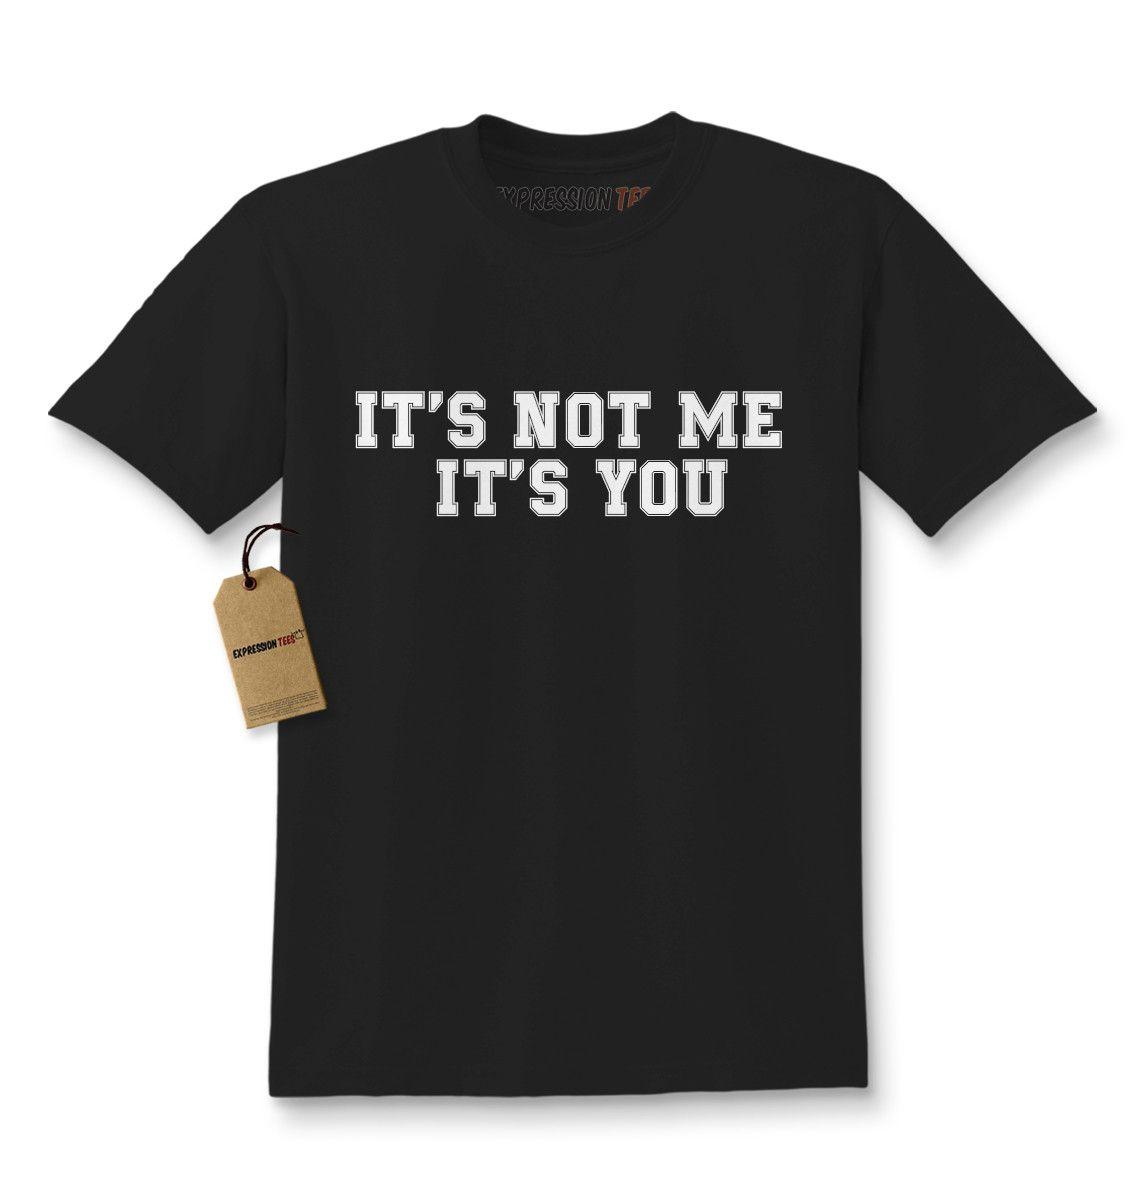 It's Not Me, It's You Kids T-shirt